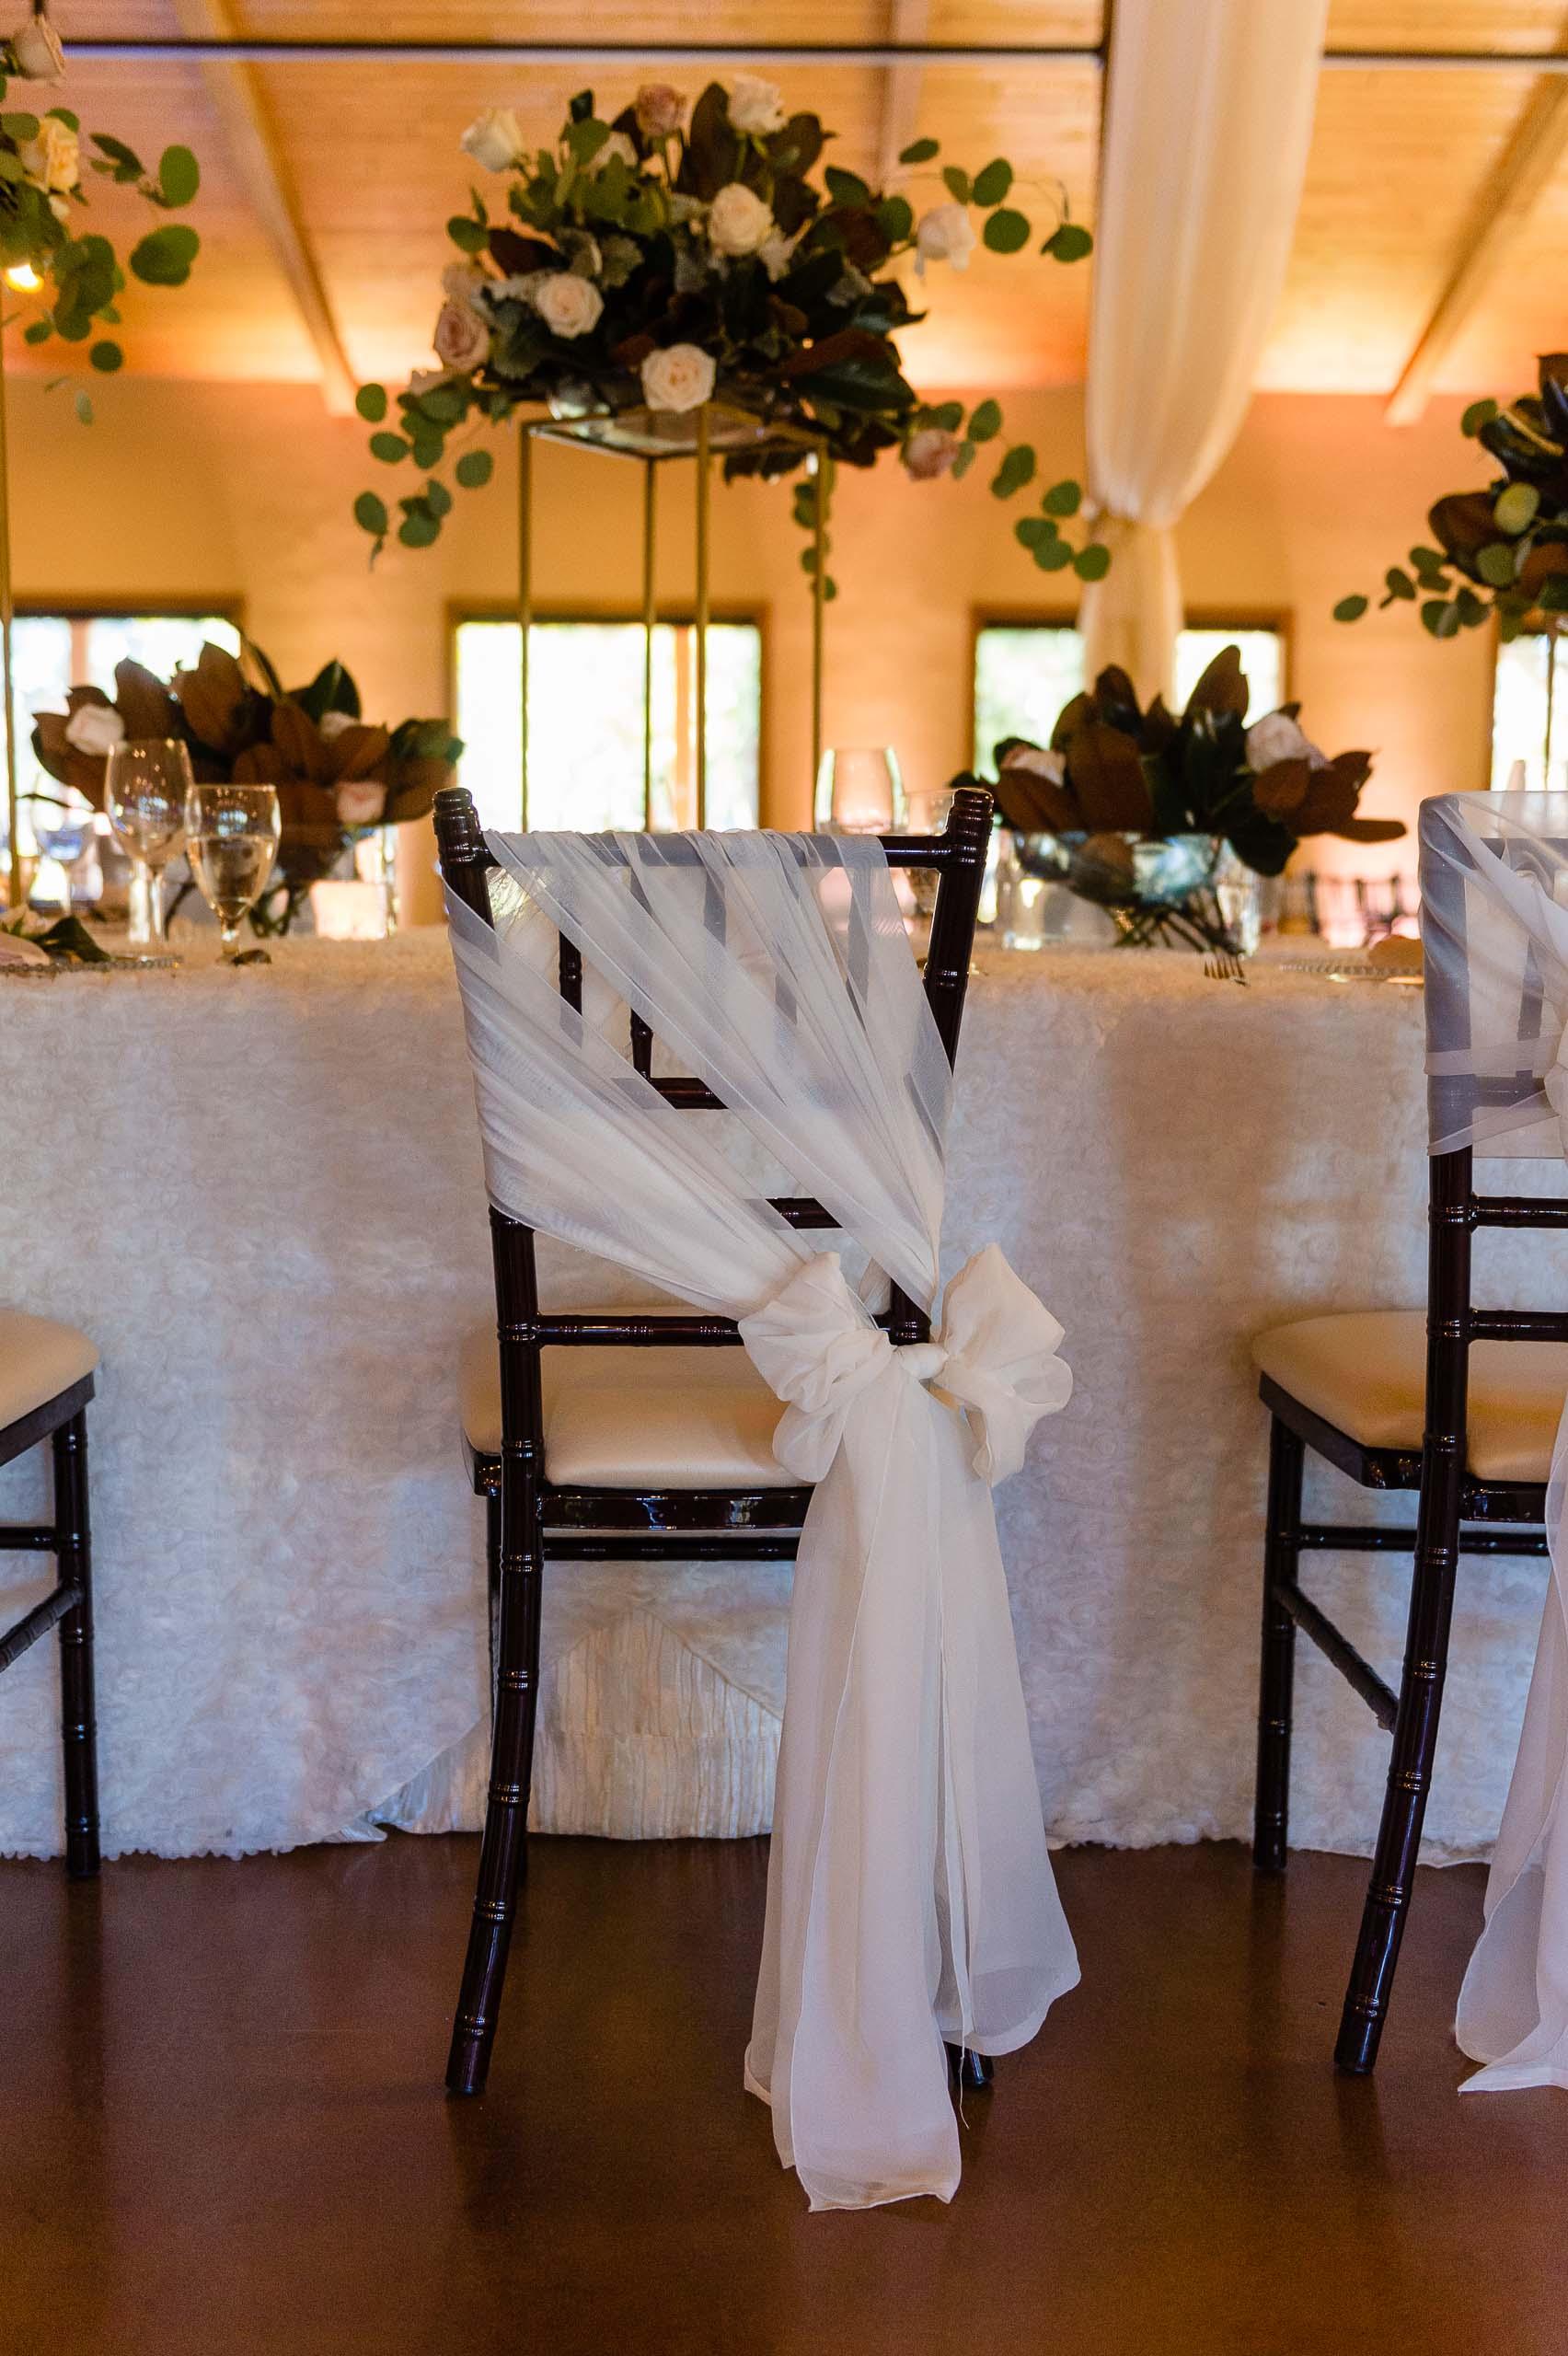 chandelier-of-gruene-winter-wedding-inspiration-_4S27992